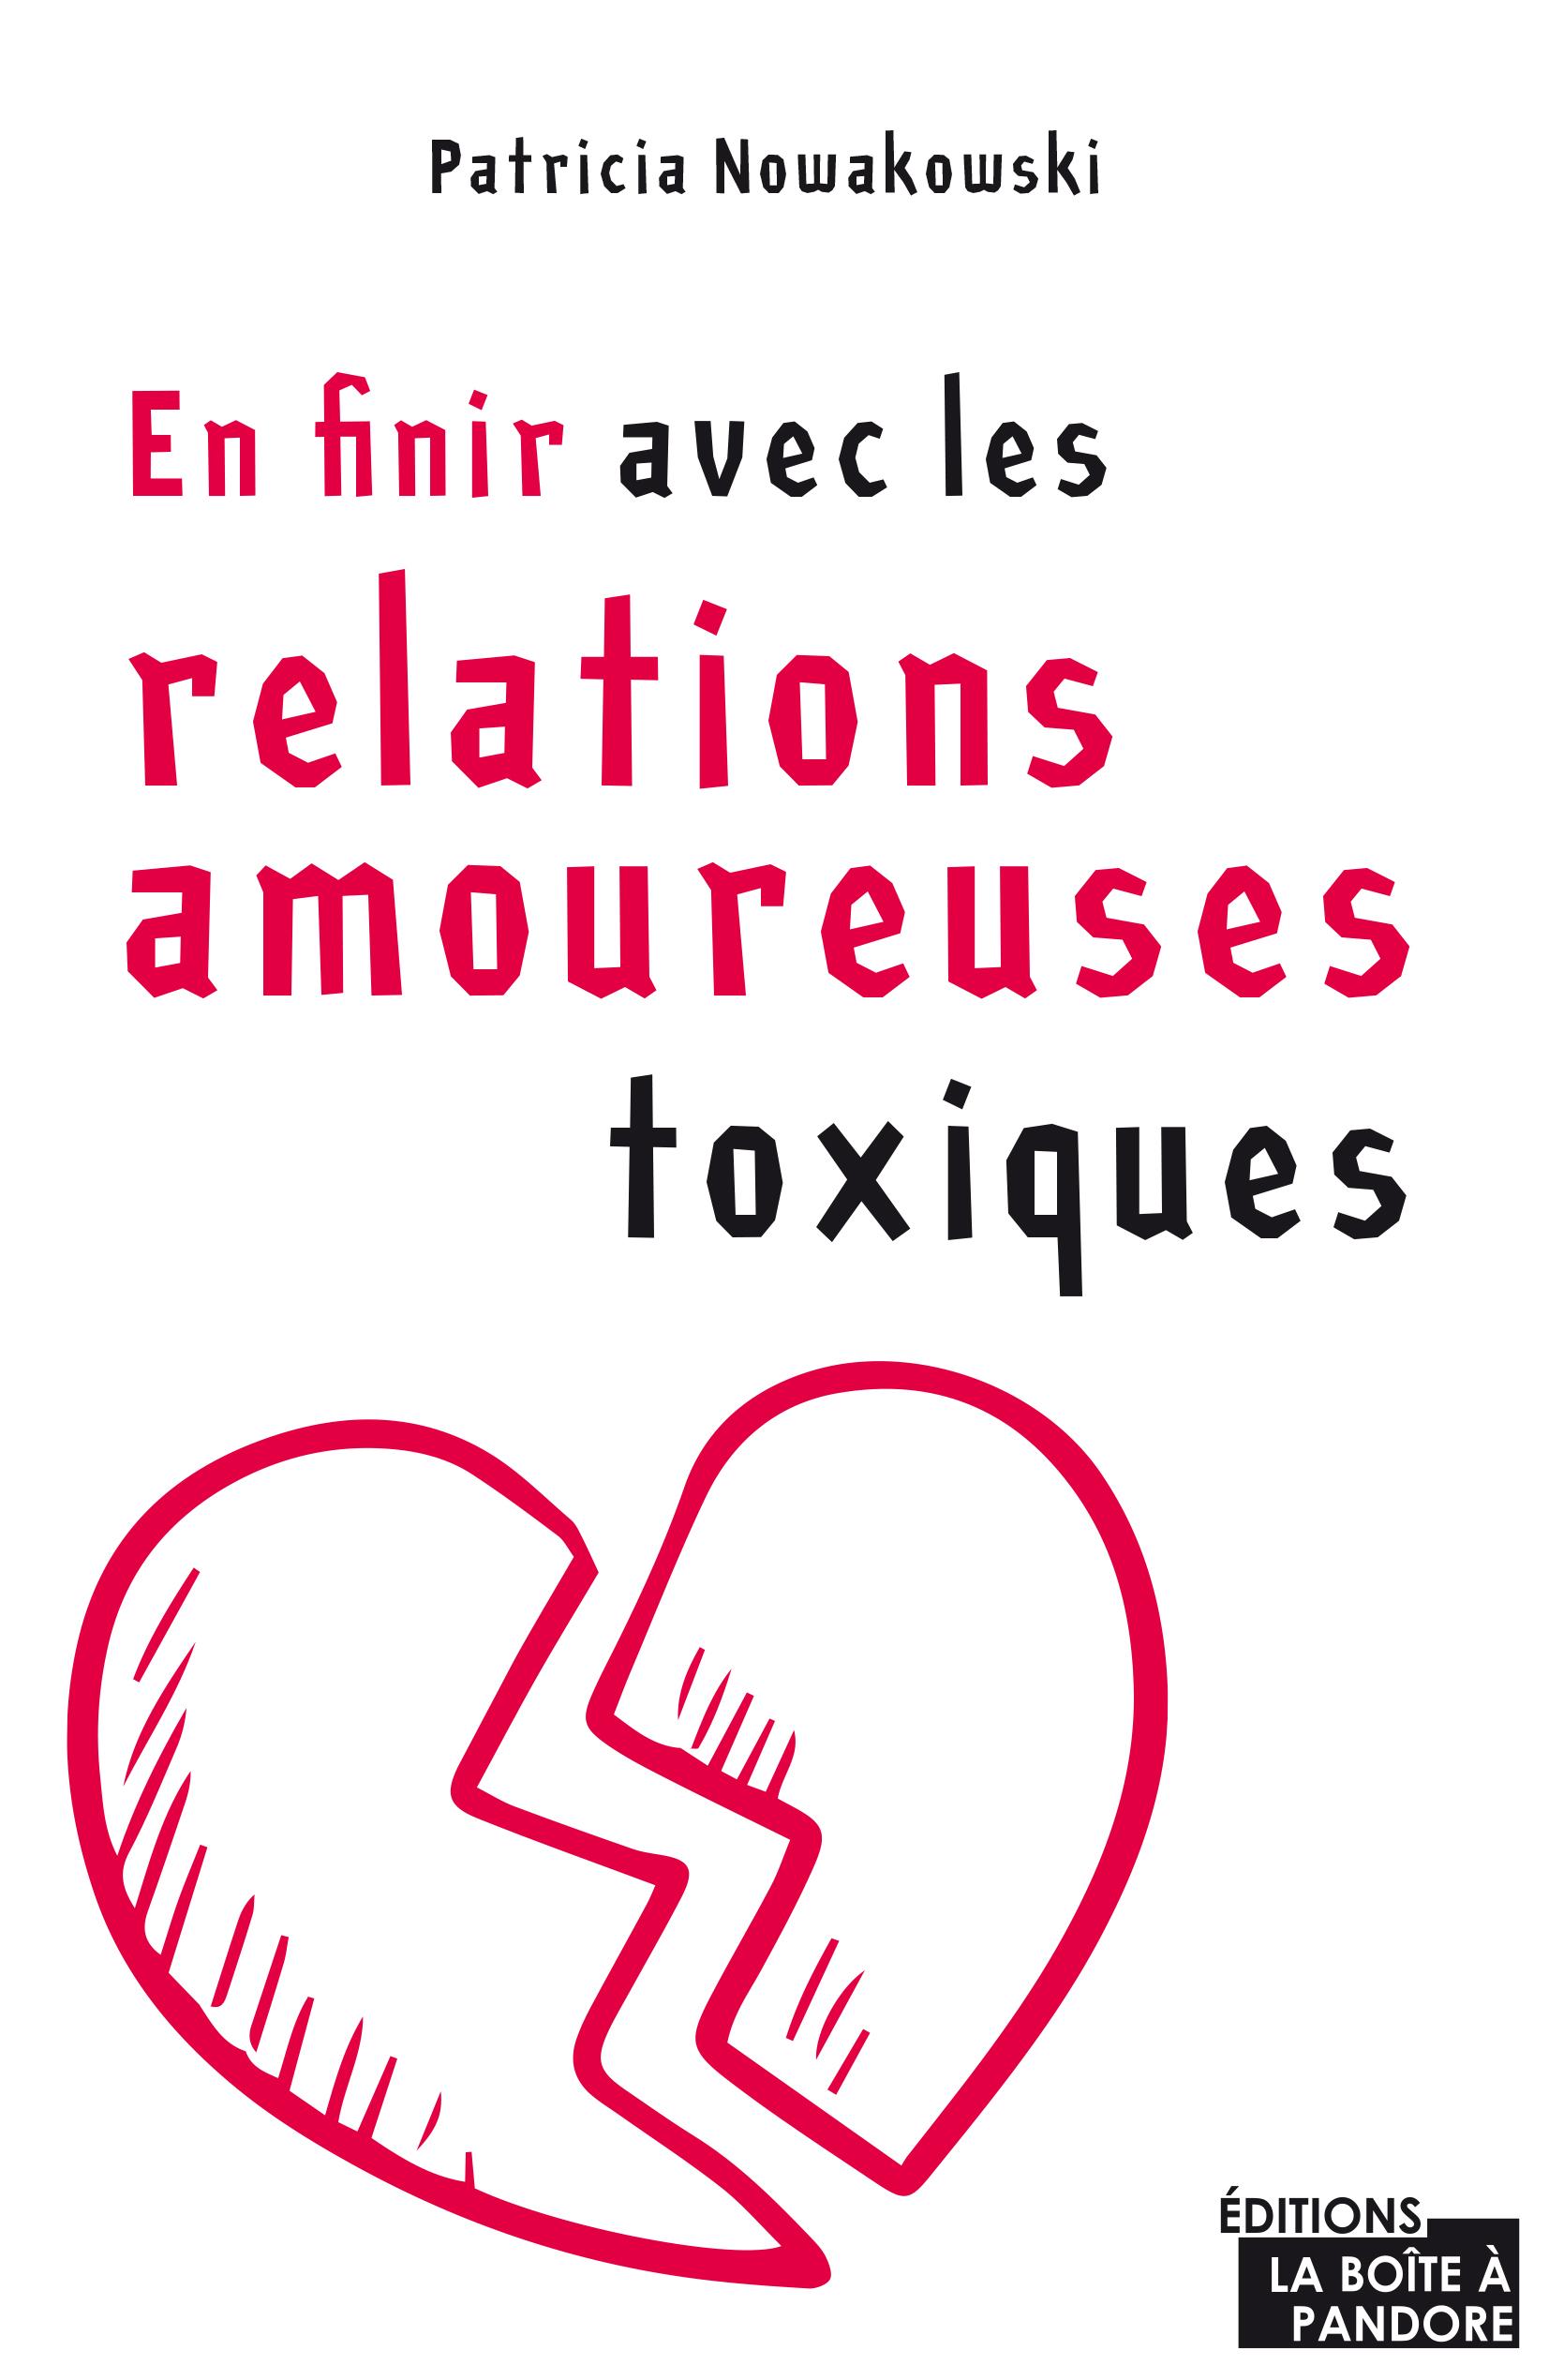 En finir avec les relations amoureuses toxiques